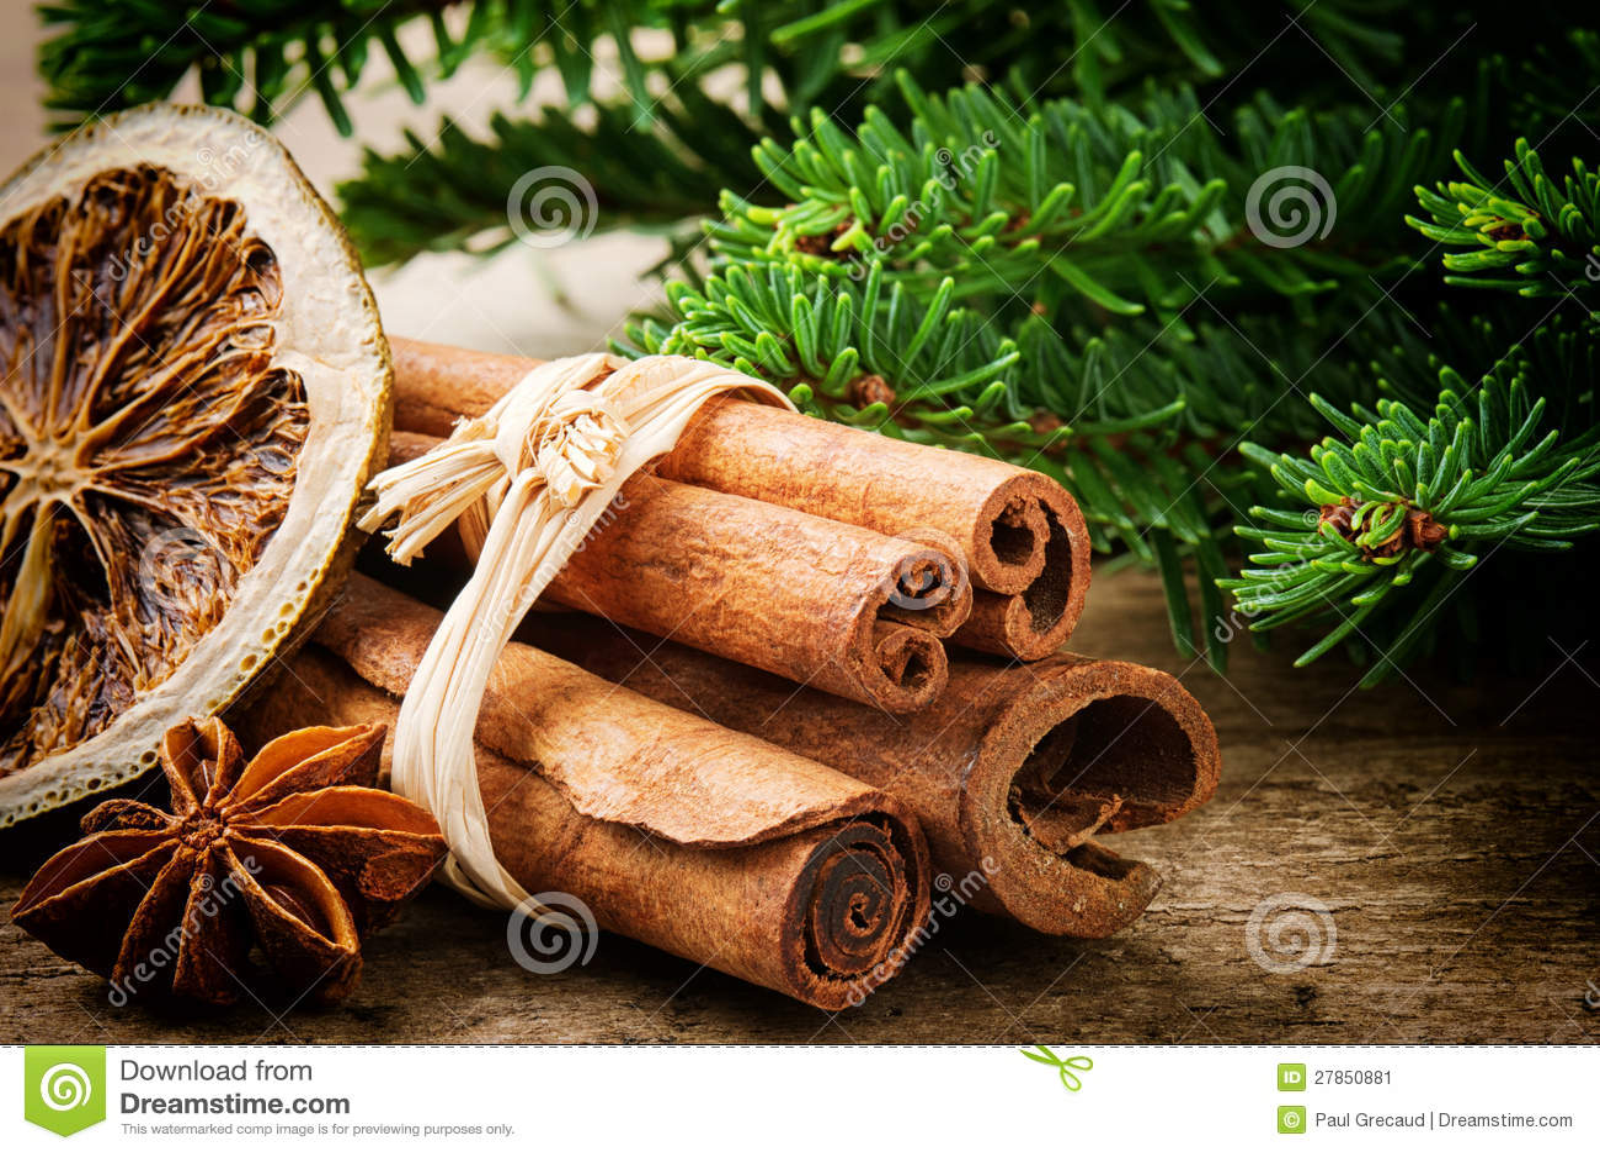 Cinnamon sticks, dried orange and aniseed